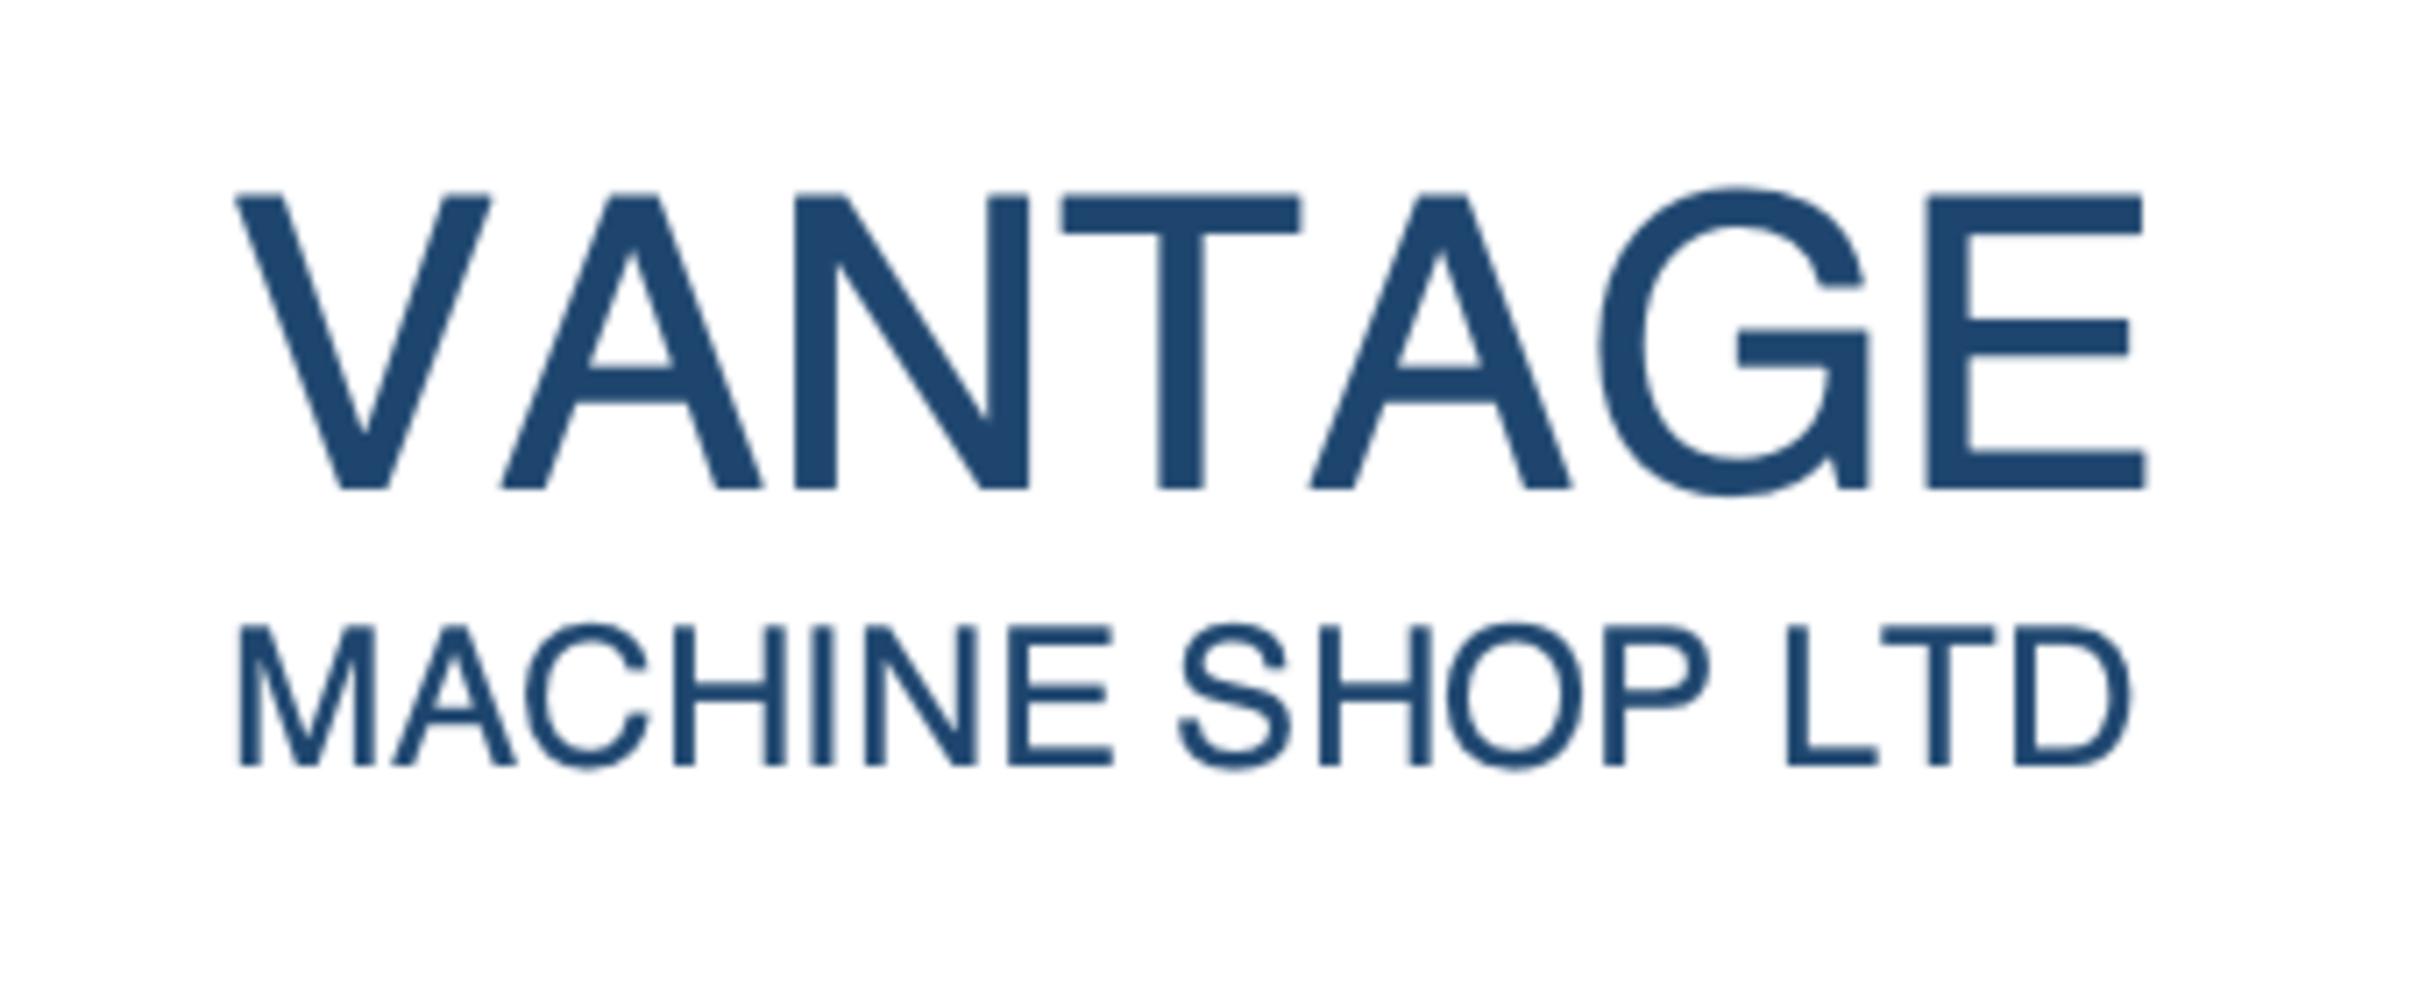 Vantage Machine Shop